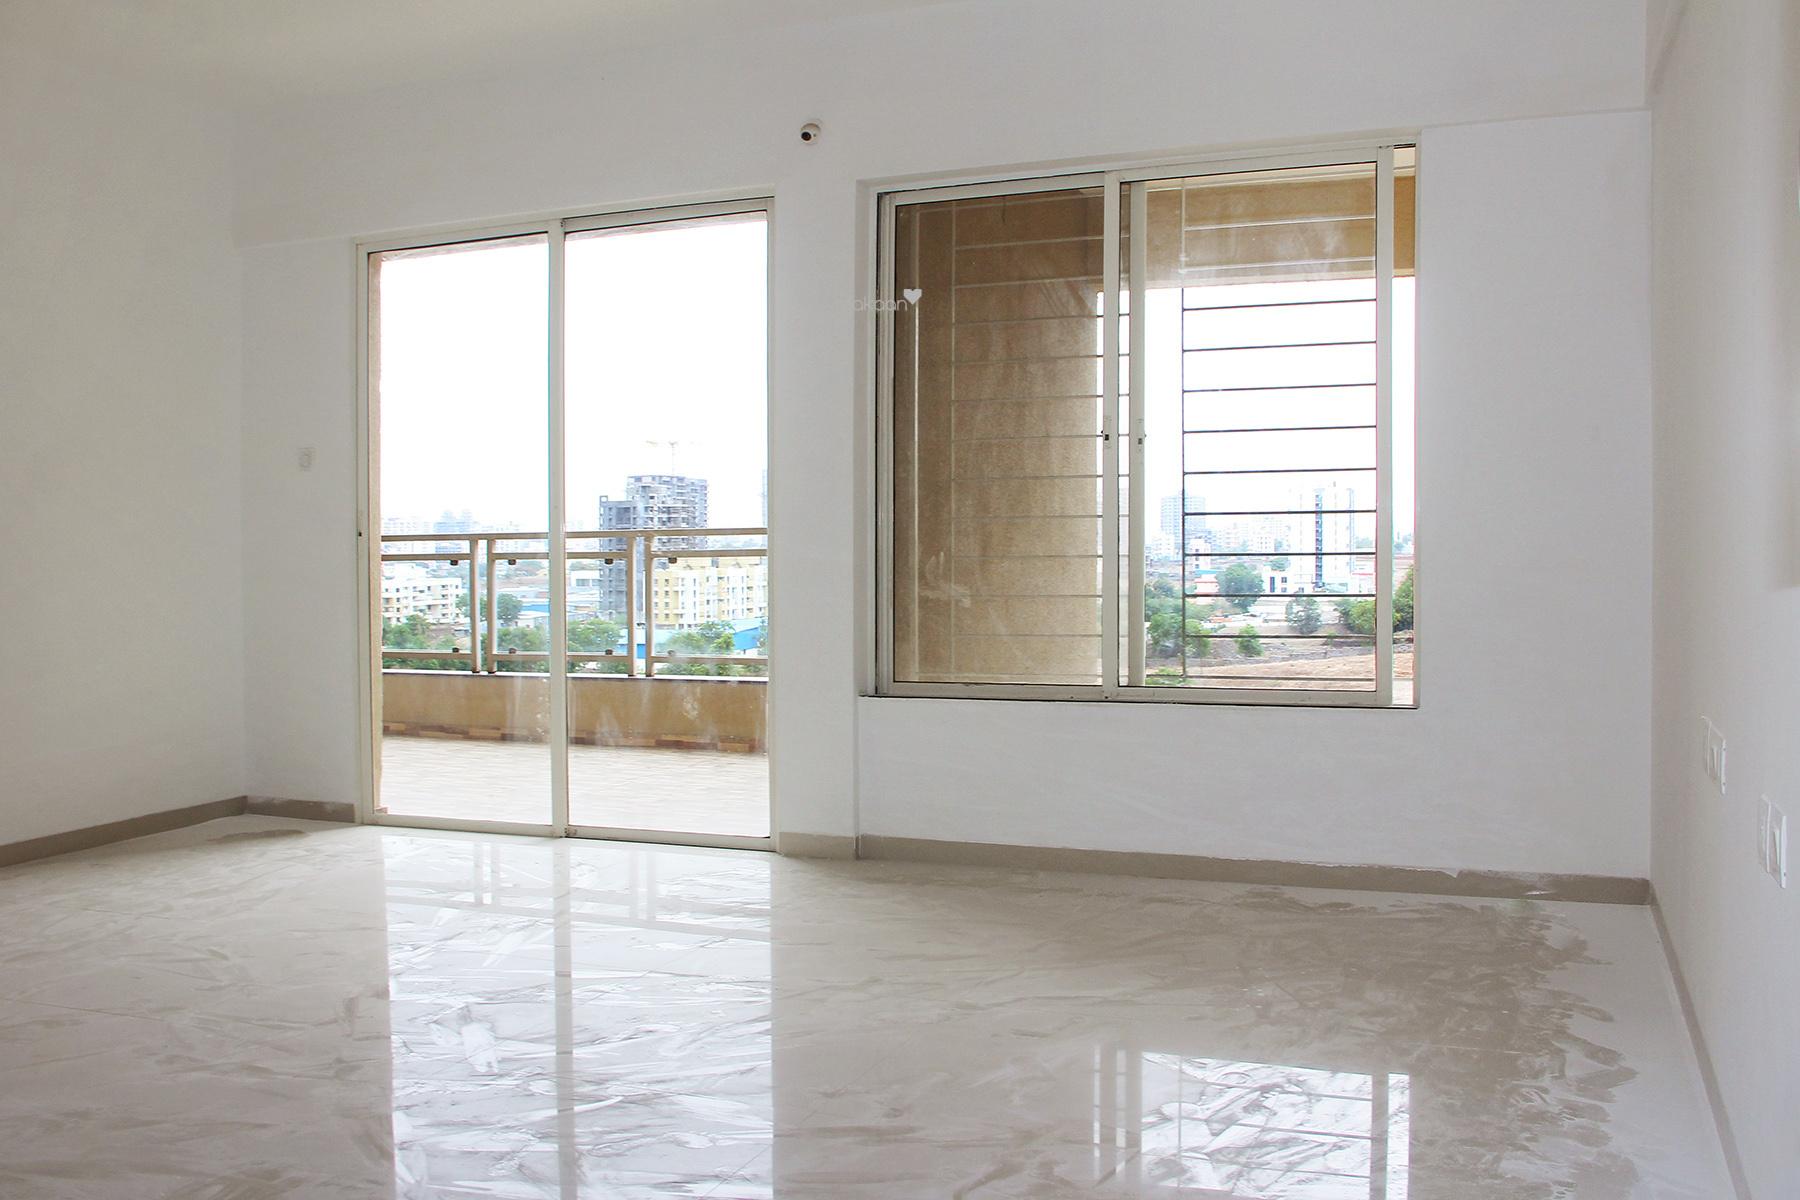 1042 sq ft 2BHK 2BHK+2T (1,042 sq ft) Property By Proptiger In Lawish, Undri